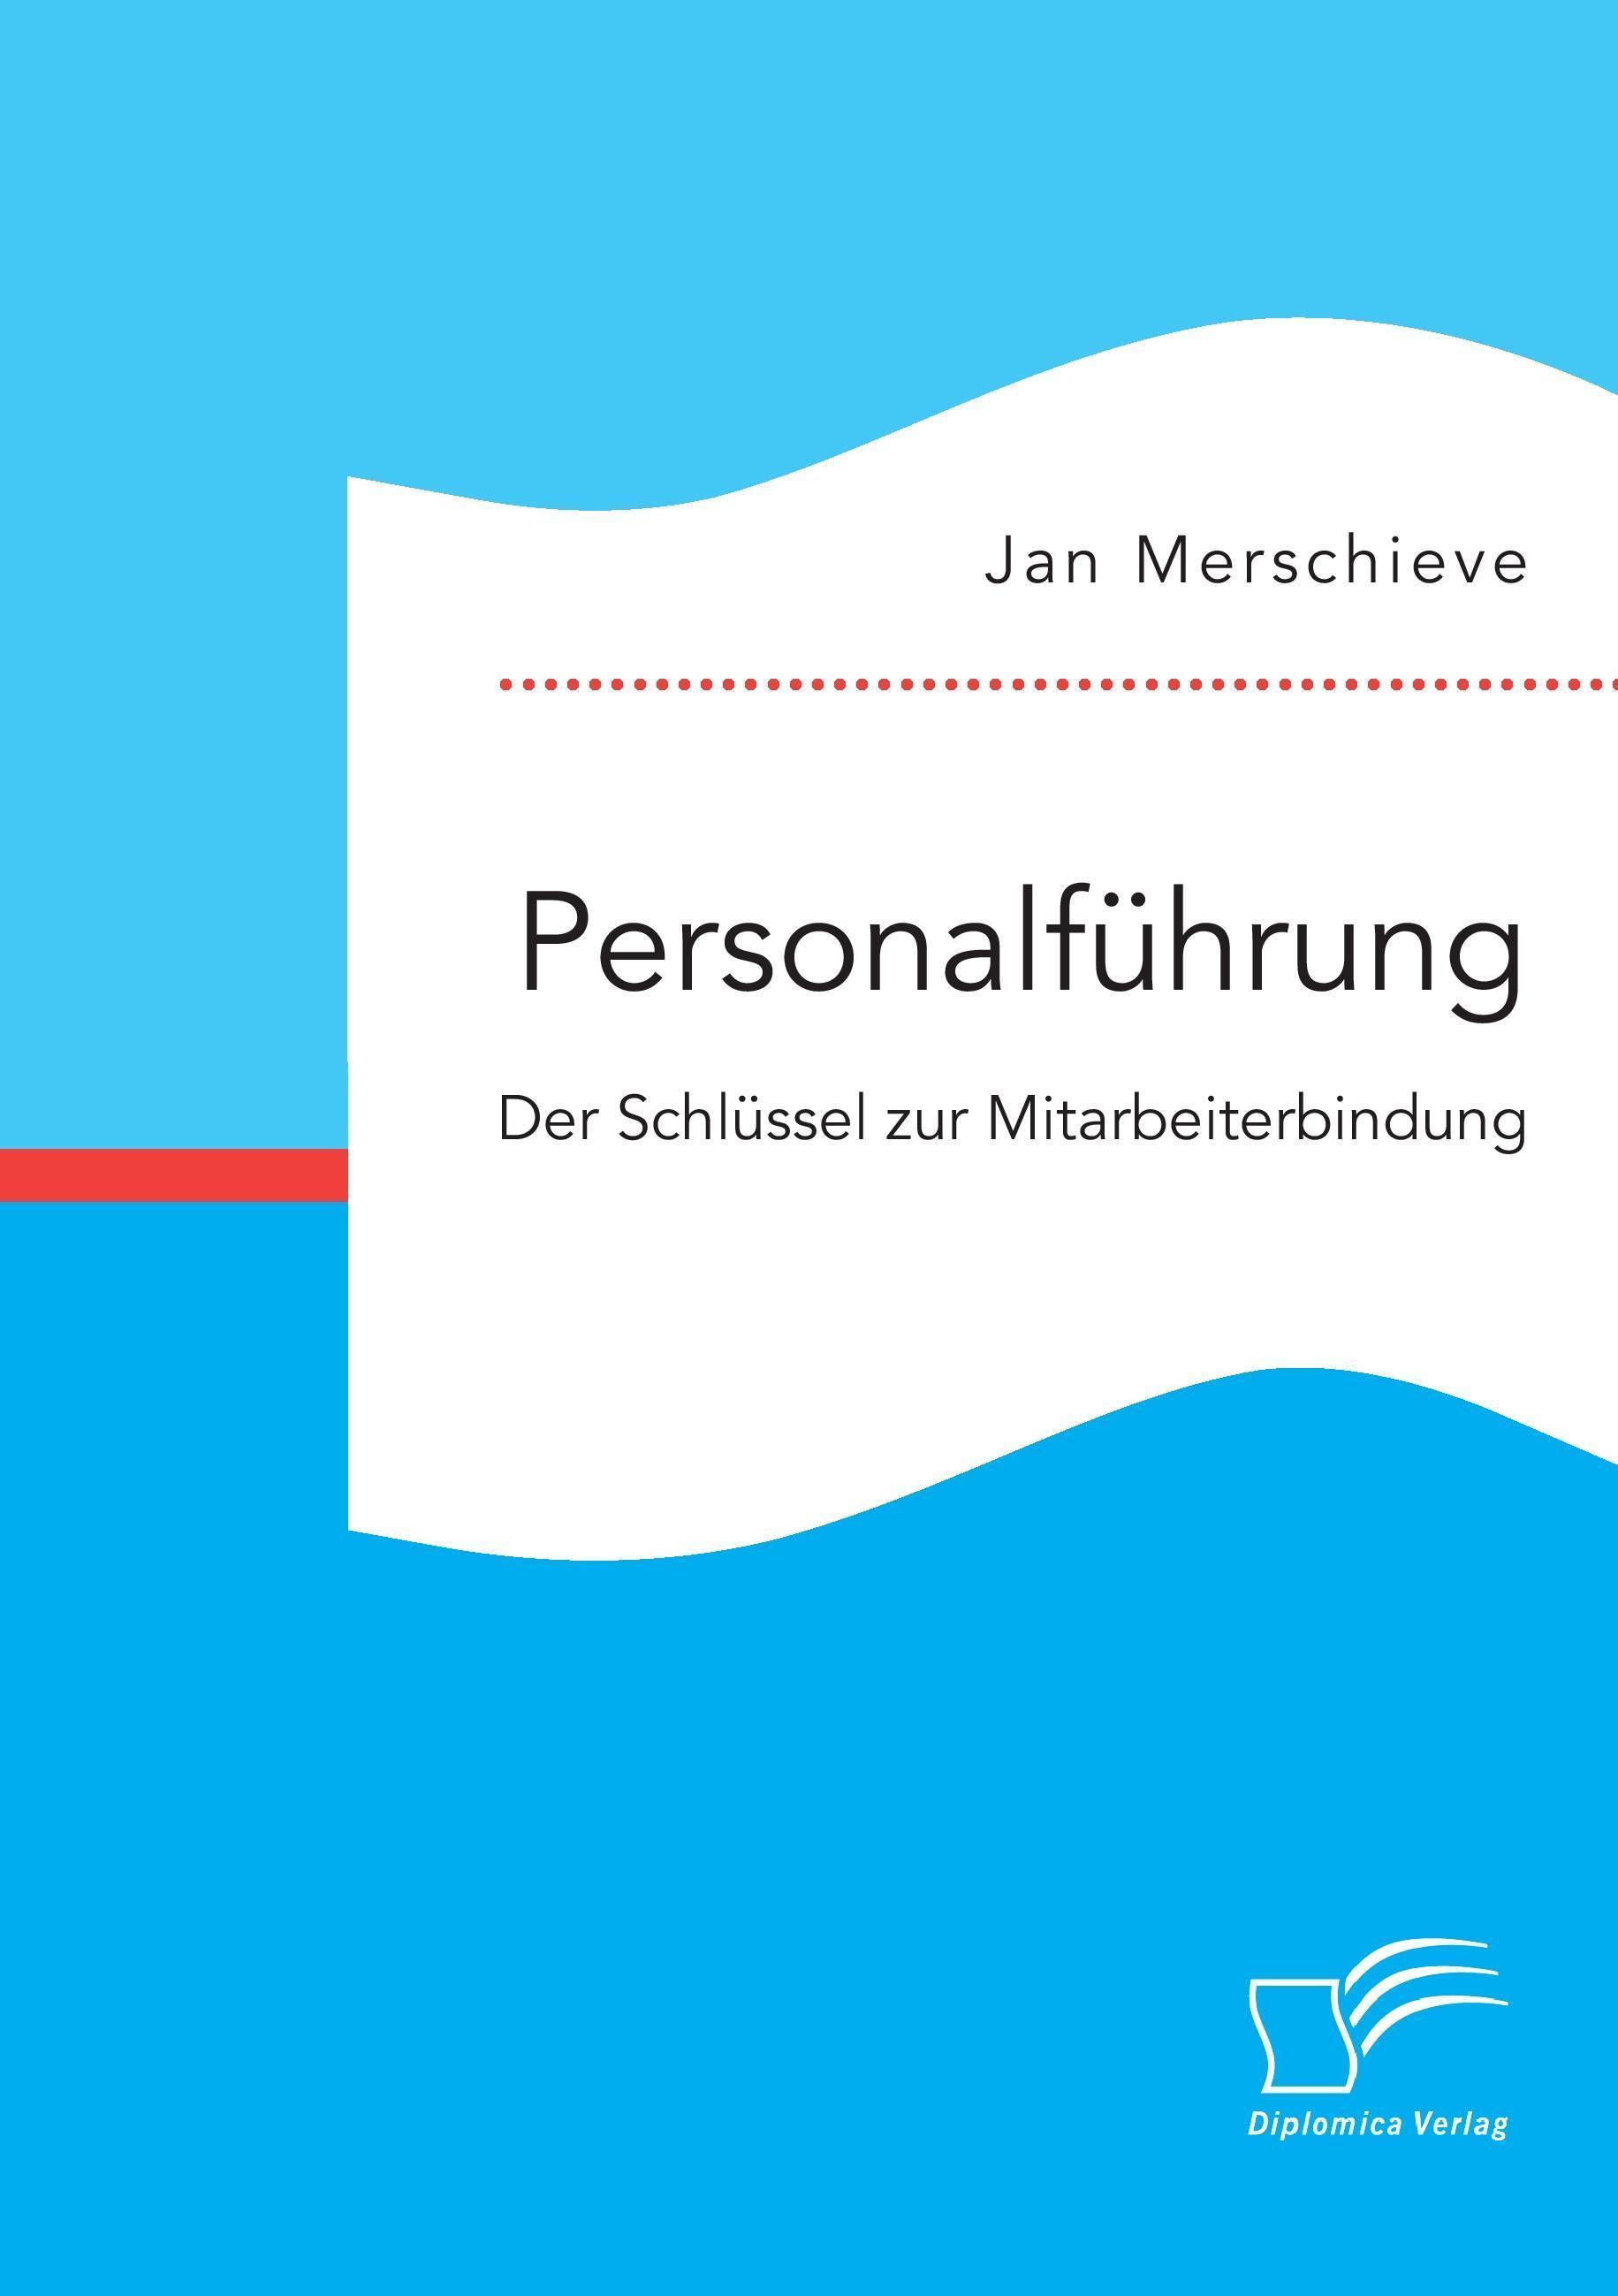 Personalführung - Jan Merschieve -  9783959349628